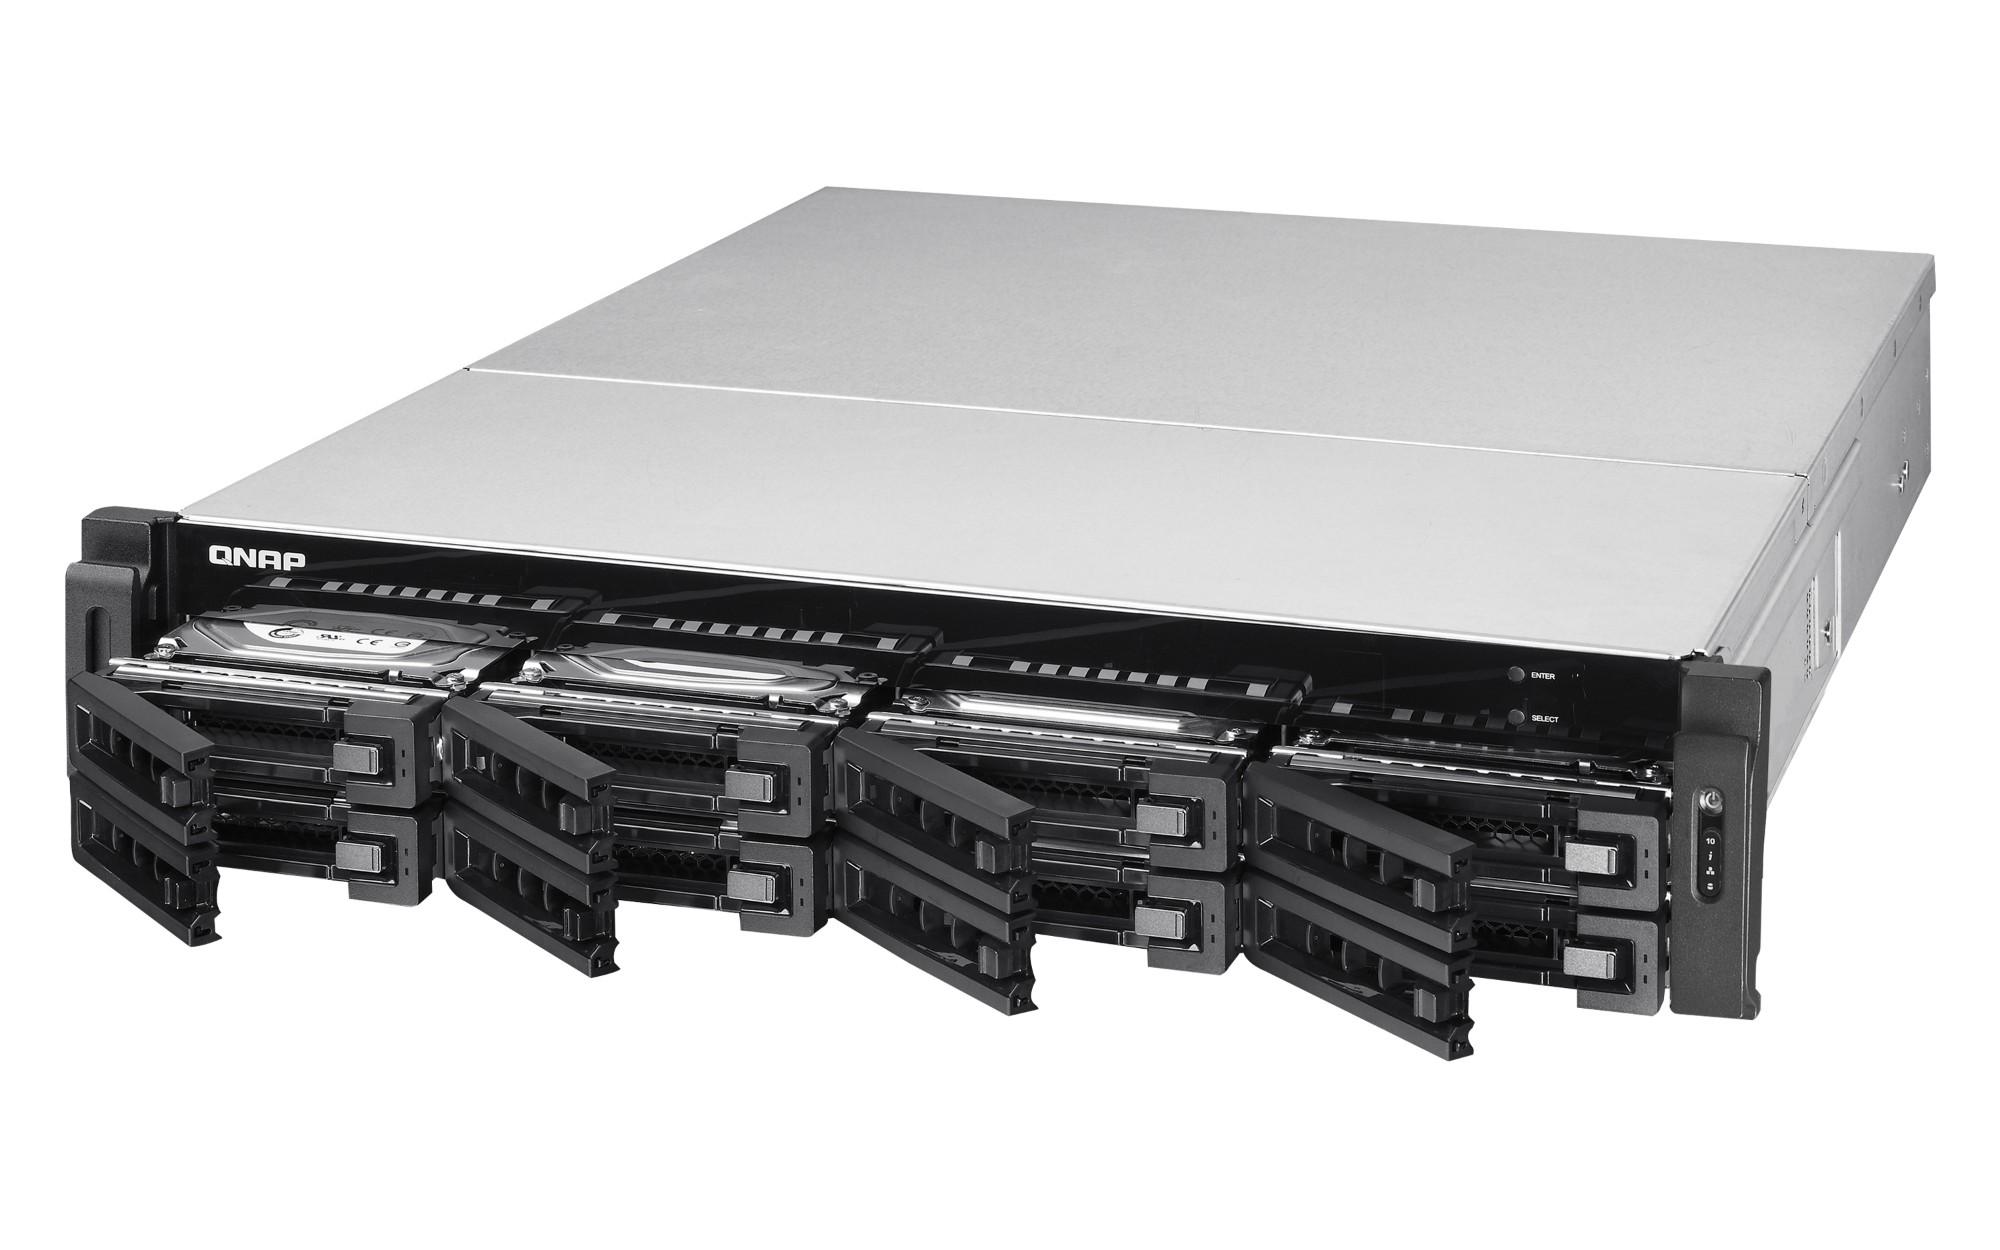 QNAP TS-EC880U R2 NAS Rack (2U) Ethernet LAN Black,Grey